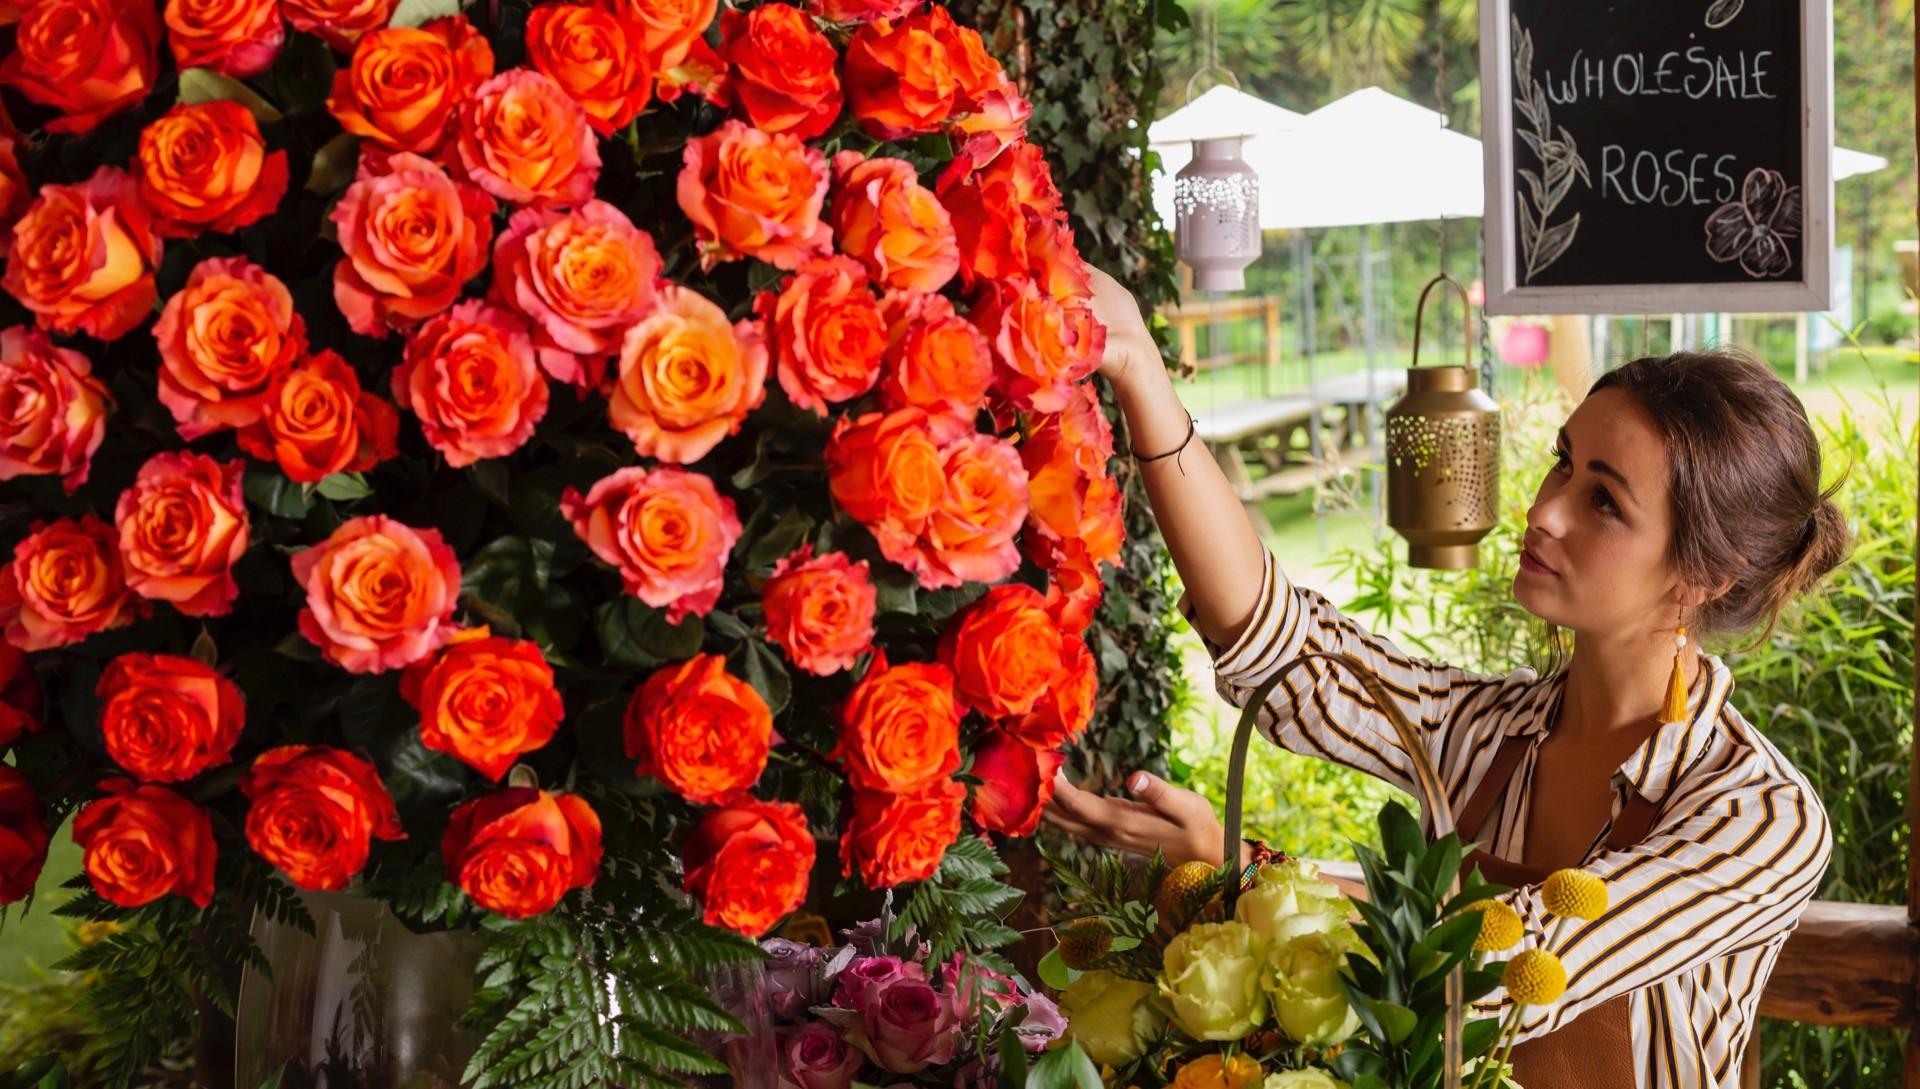 Bellevue Roses Wholesale